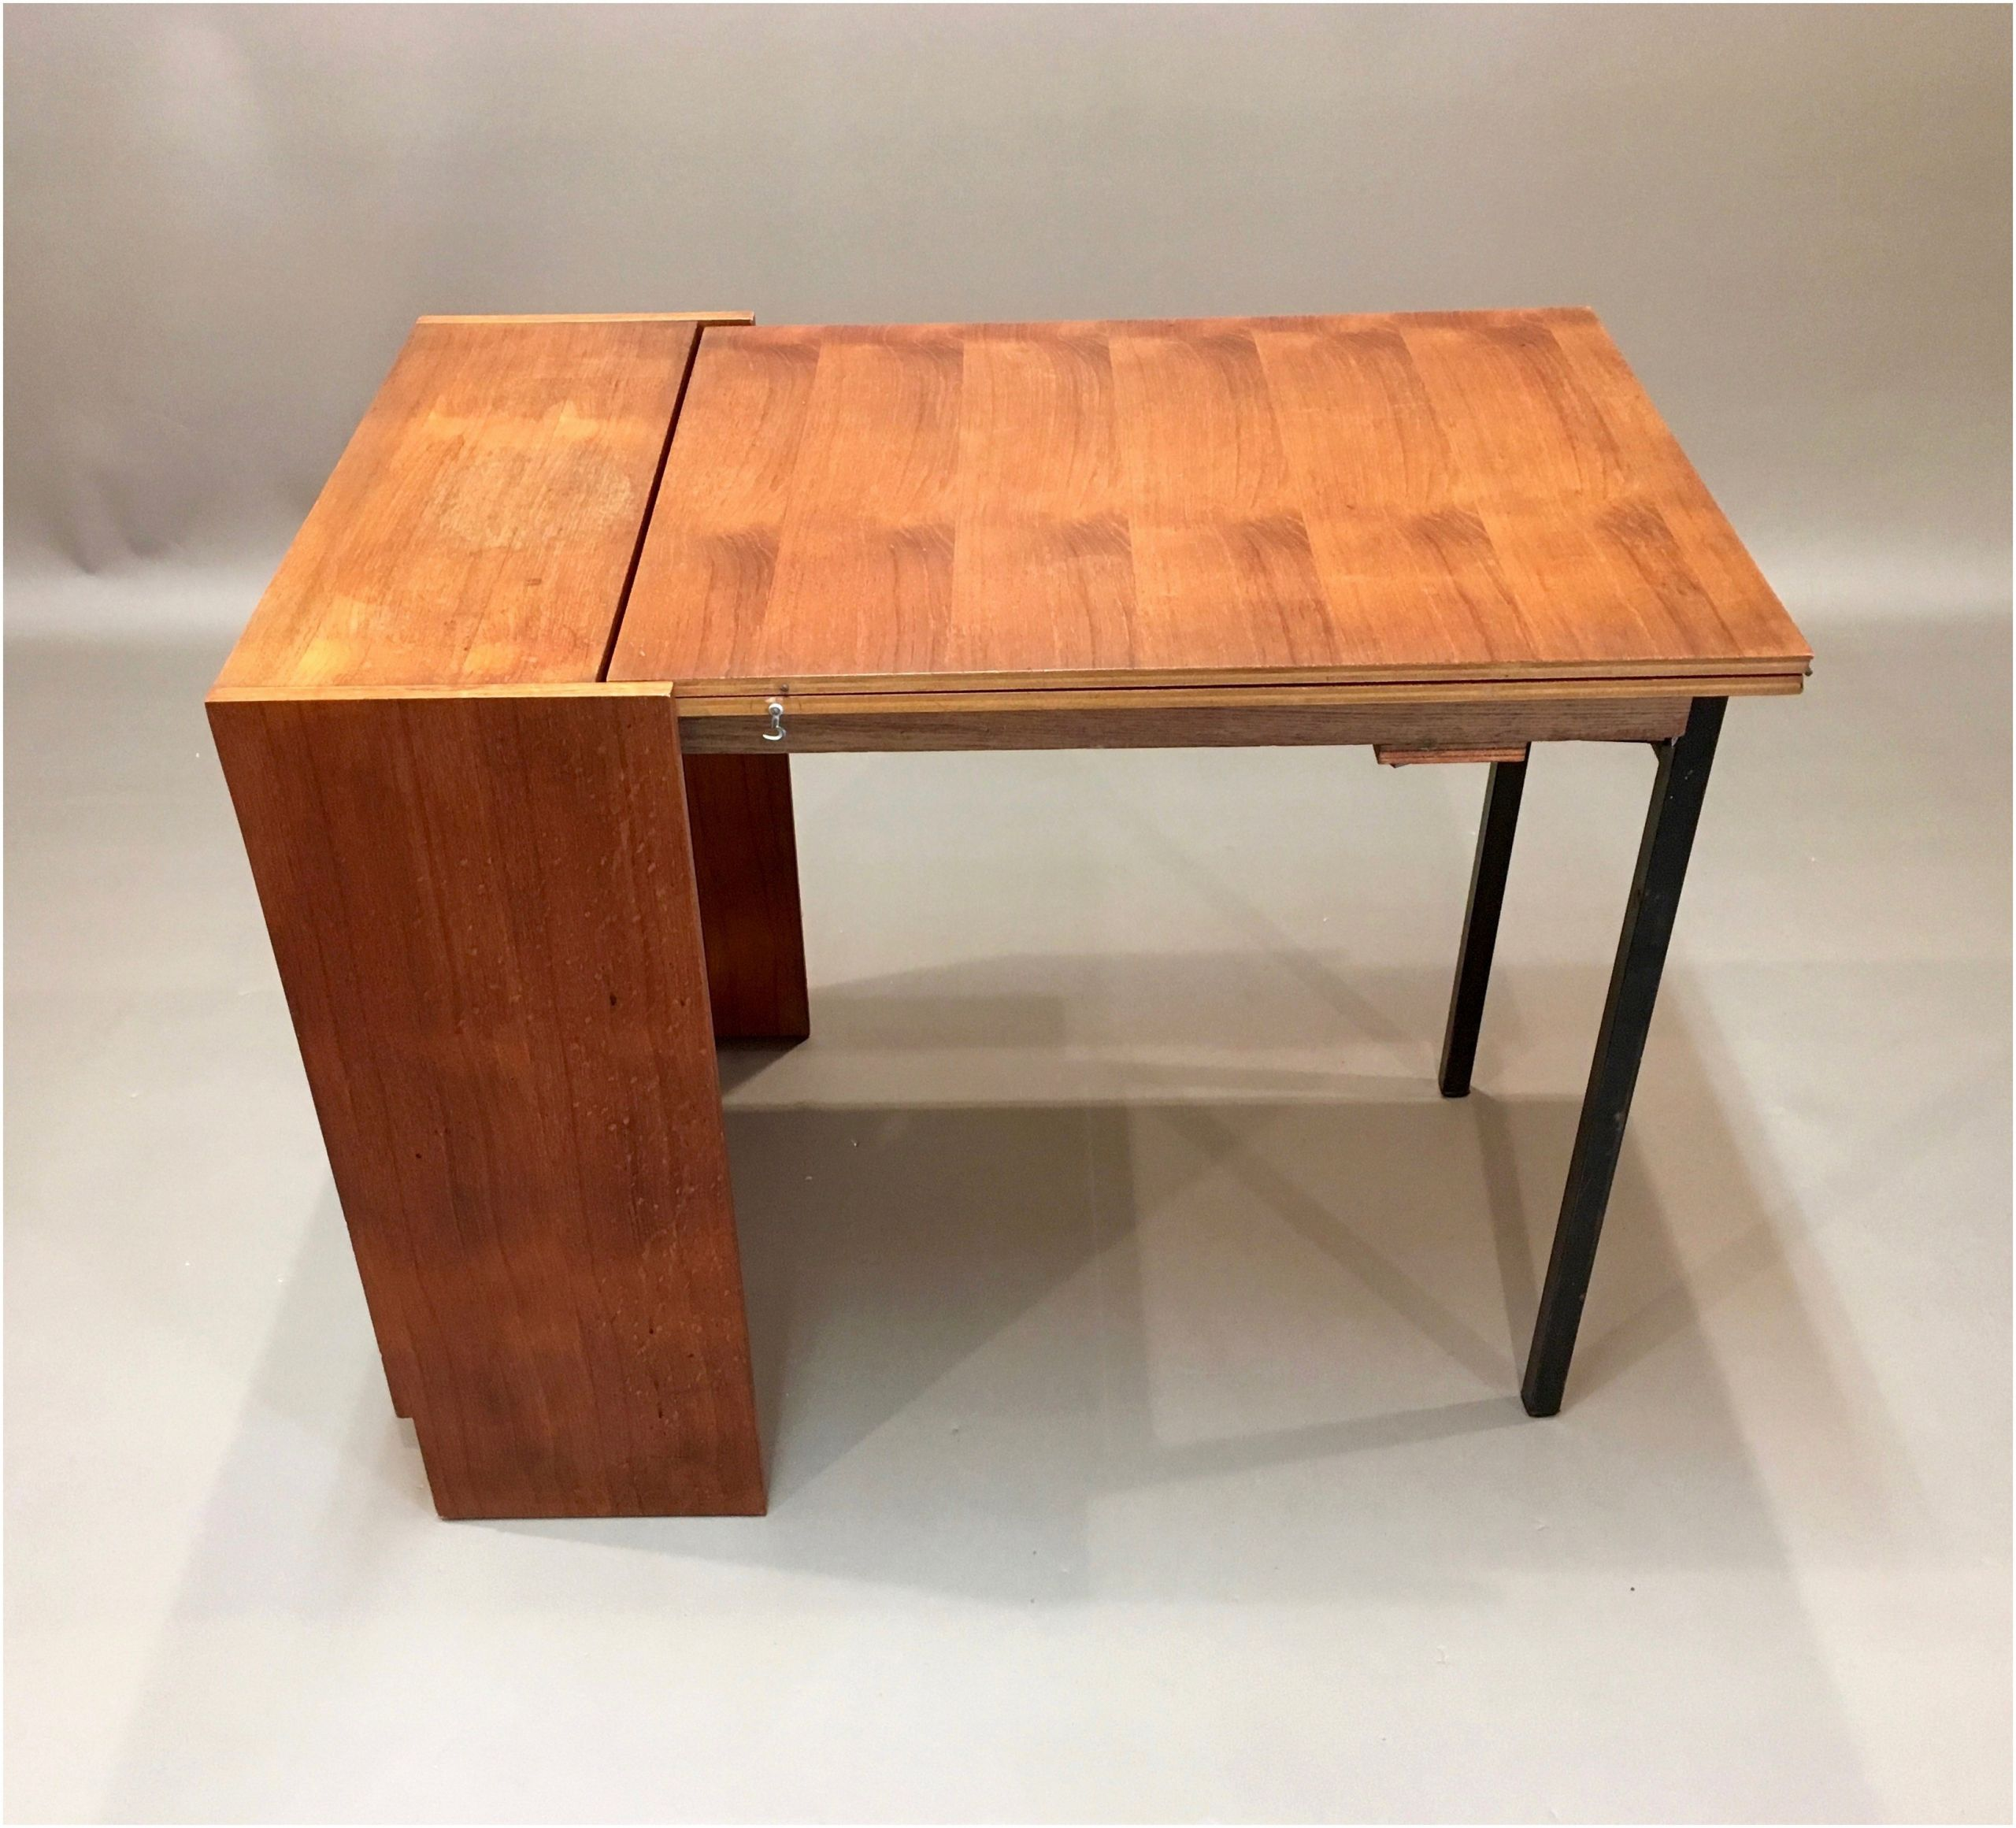 meuble bois palissandre meuble en palissandre meuble tv palissandre nouveau meuble tv bois of meuble bois palissandre 5